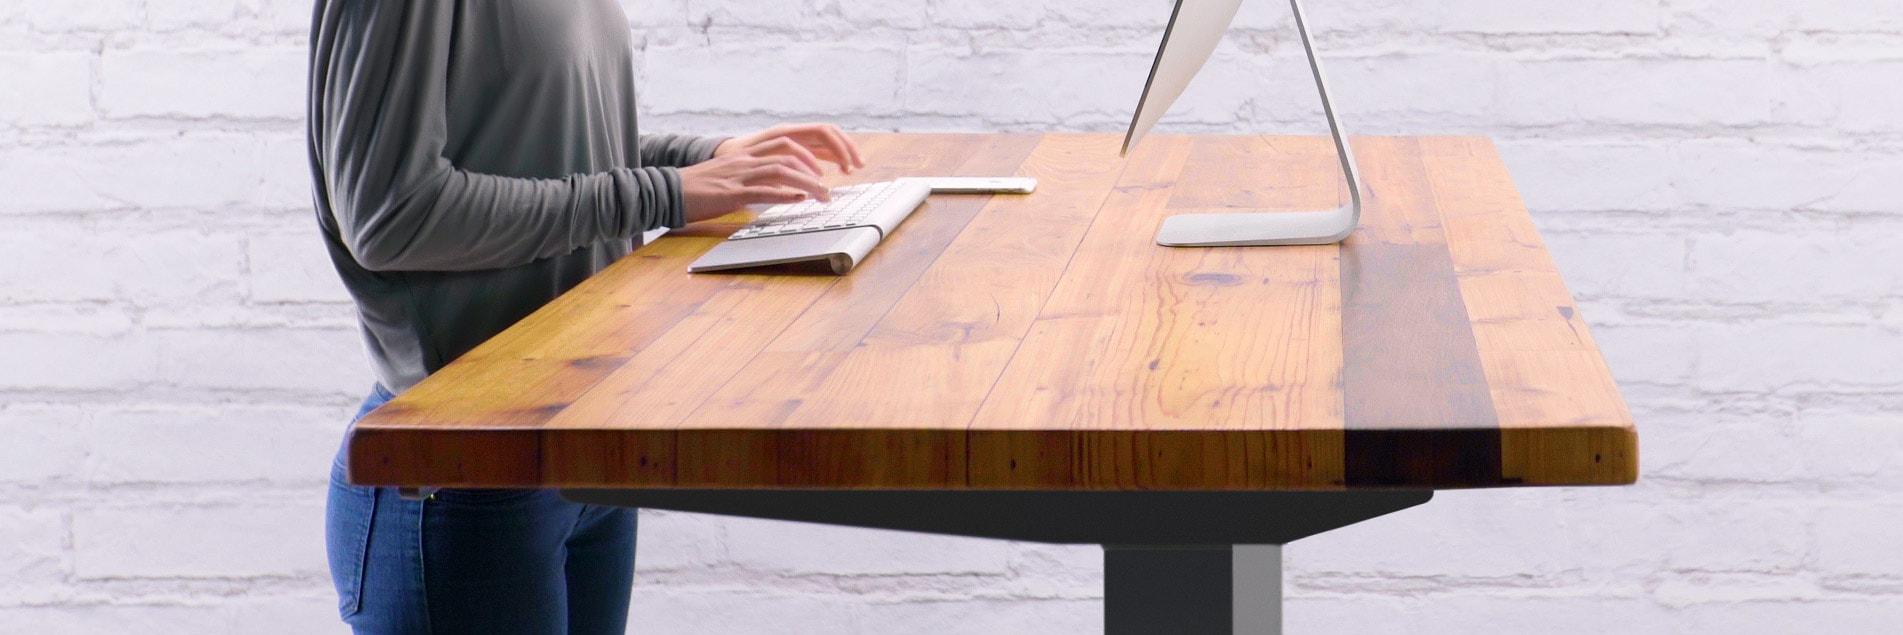 Height Adjustable Standing Desk | UPLIFT Desk